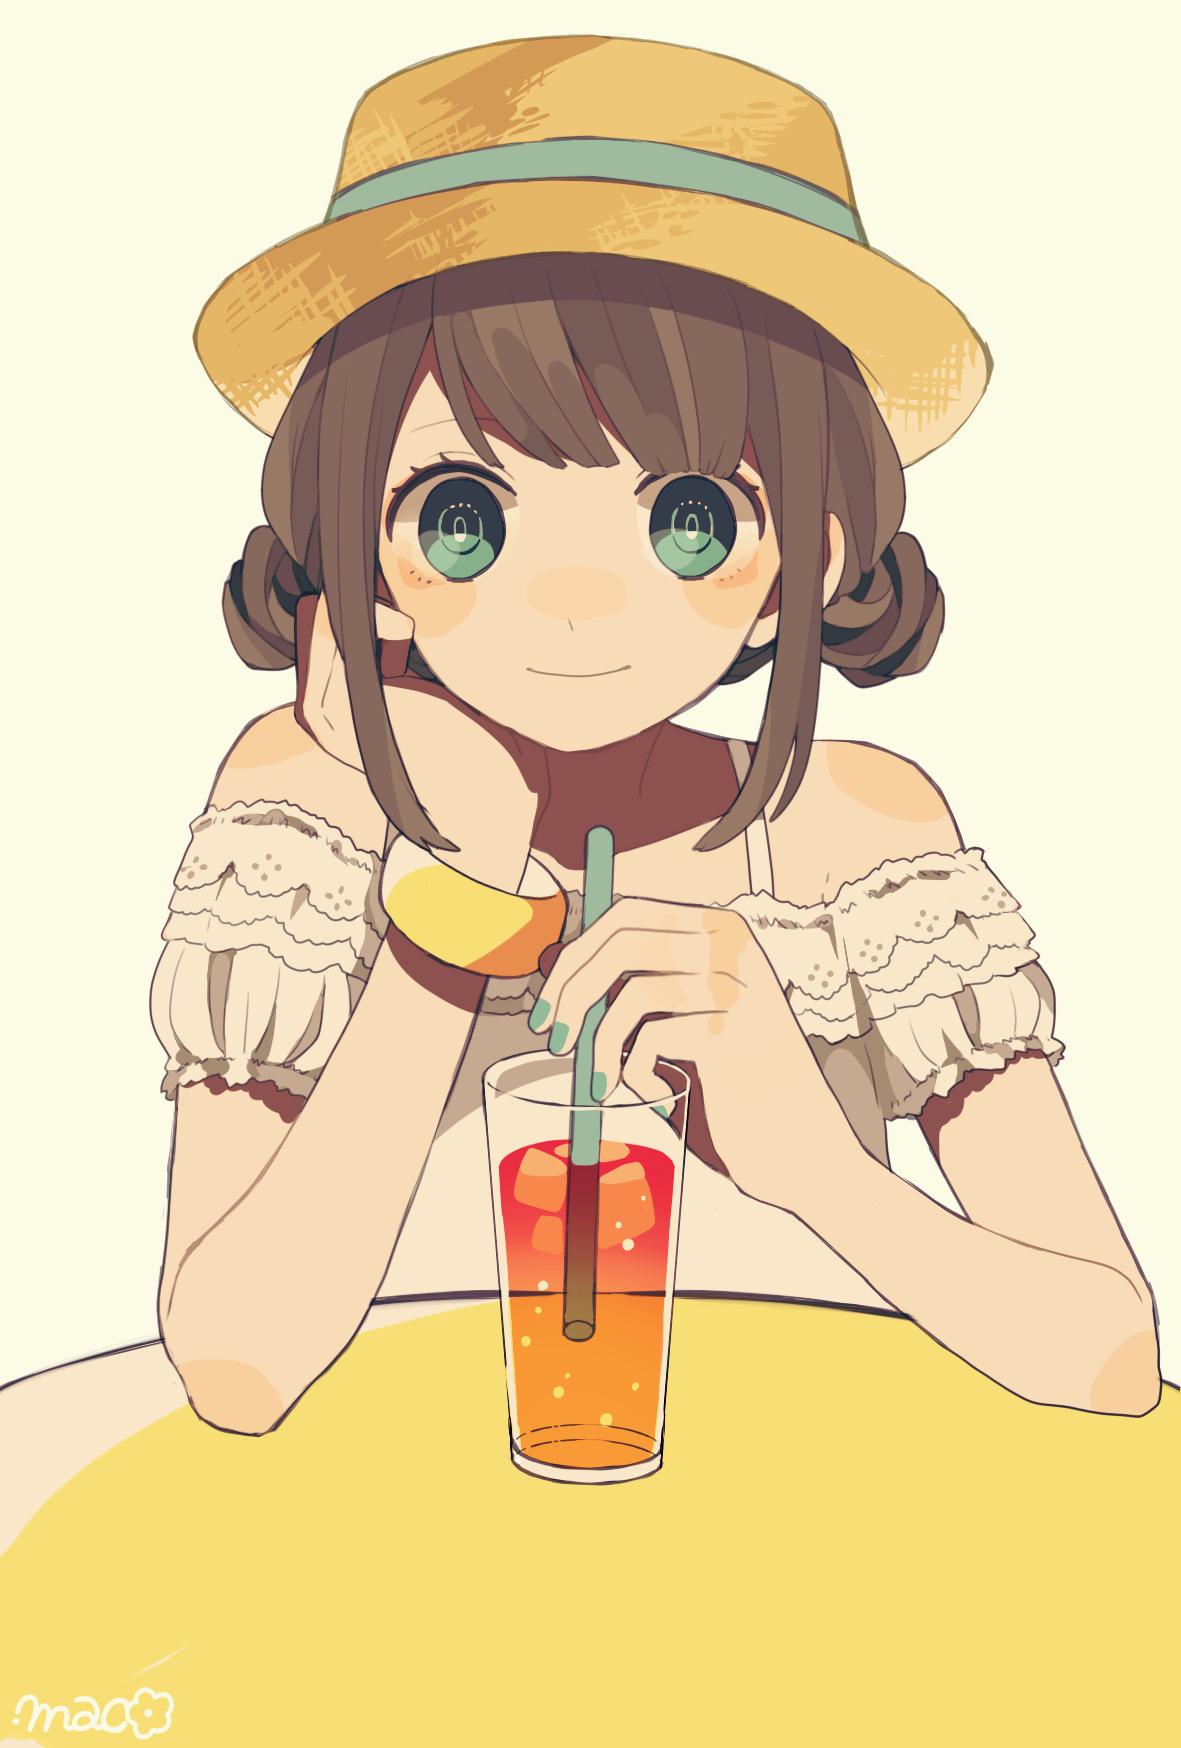 Pin on Anime Original & Other Stuff